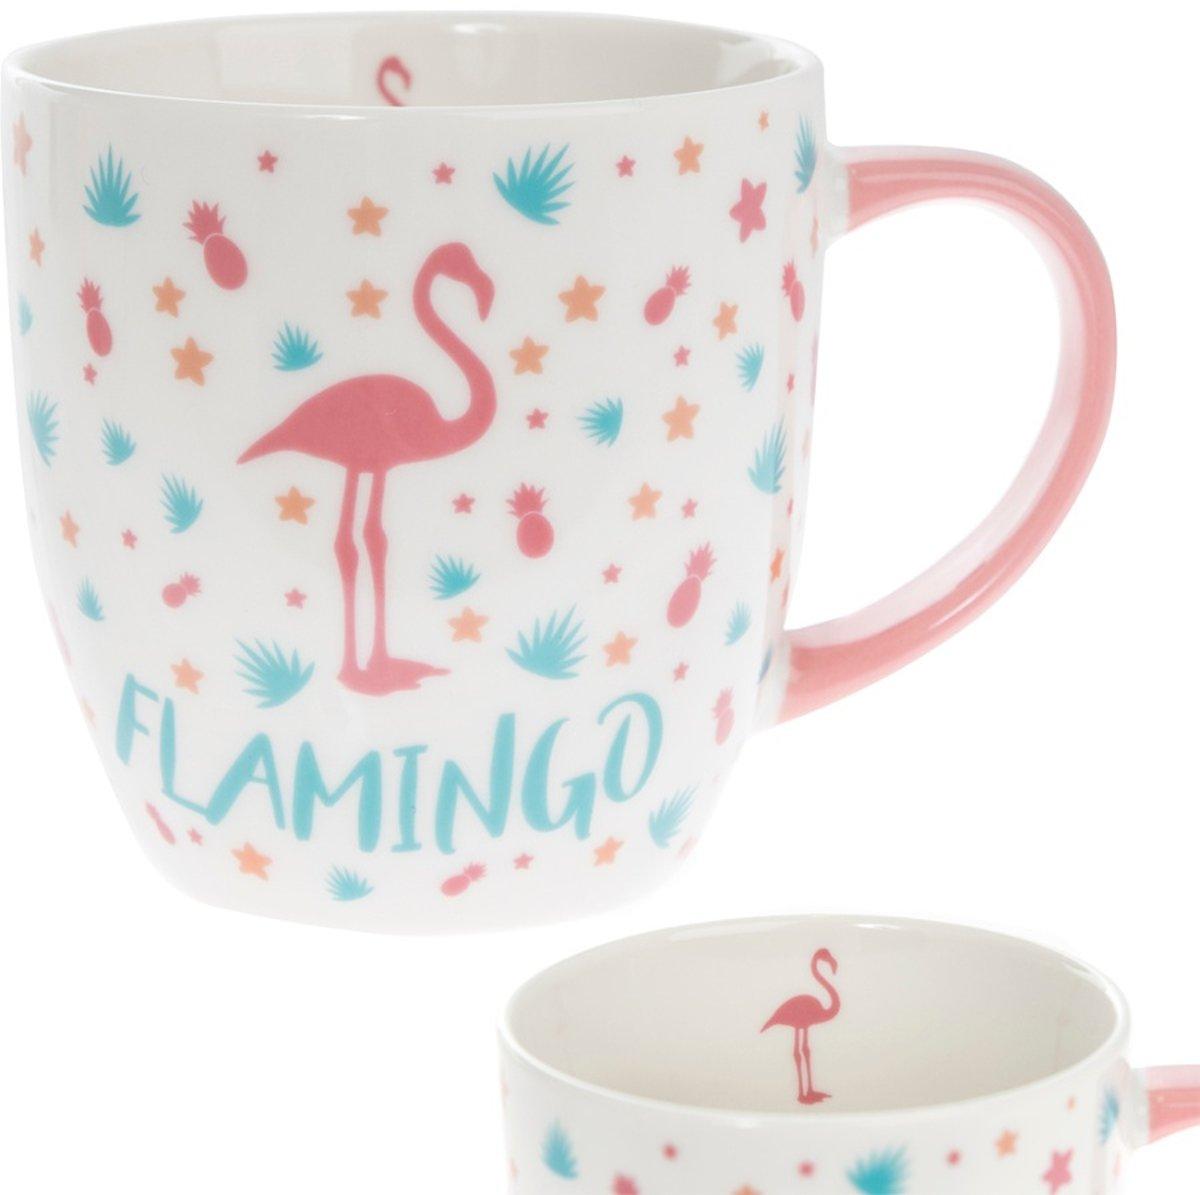 Mok / drinkbeker met afbeelding flamingo .